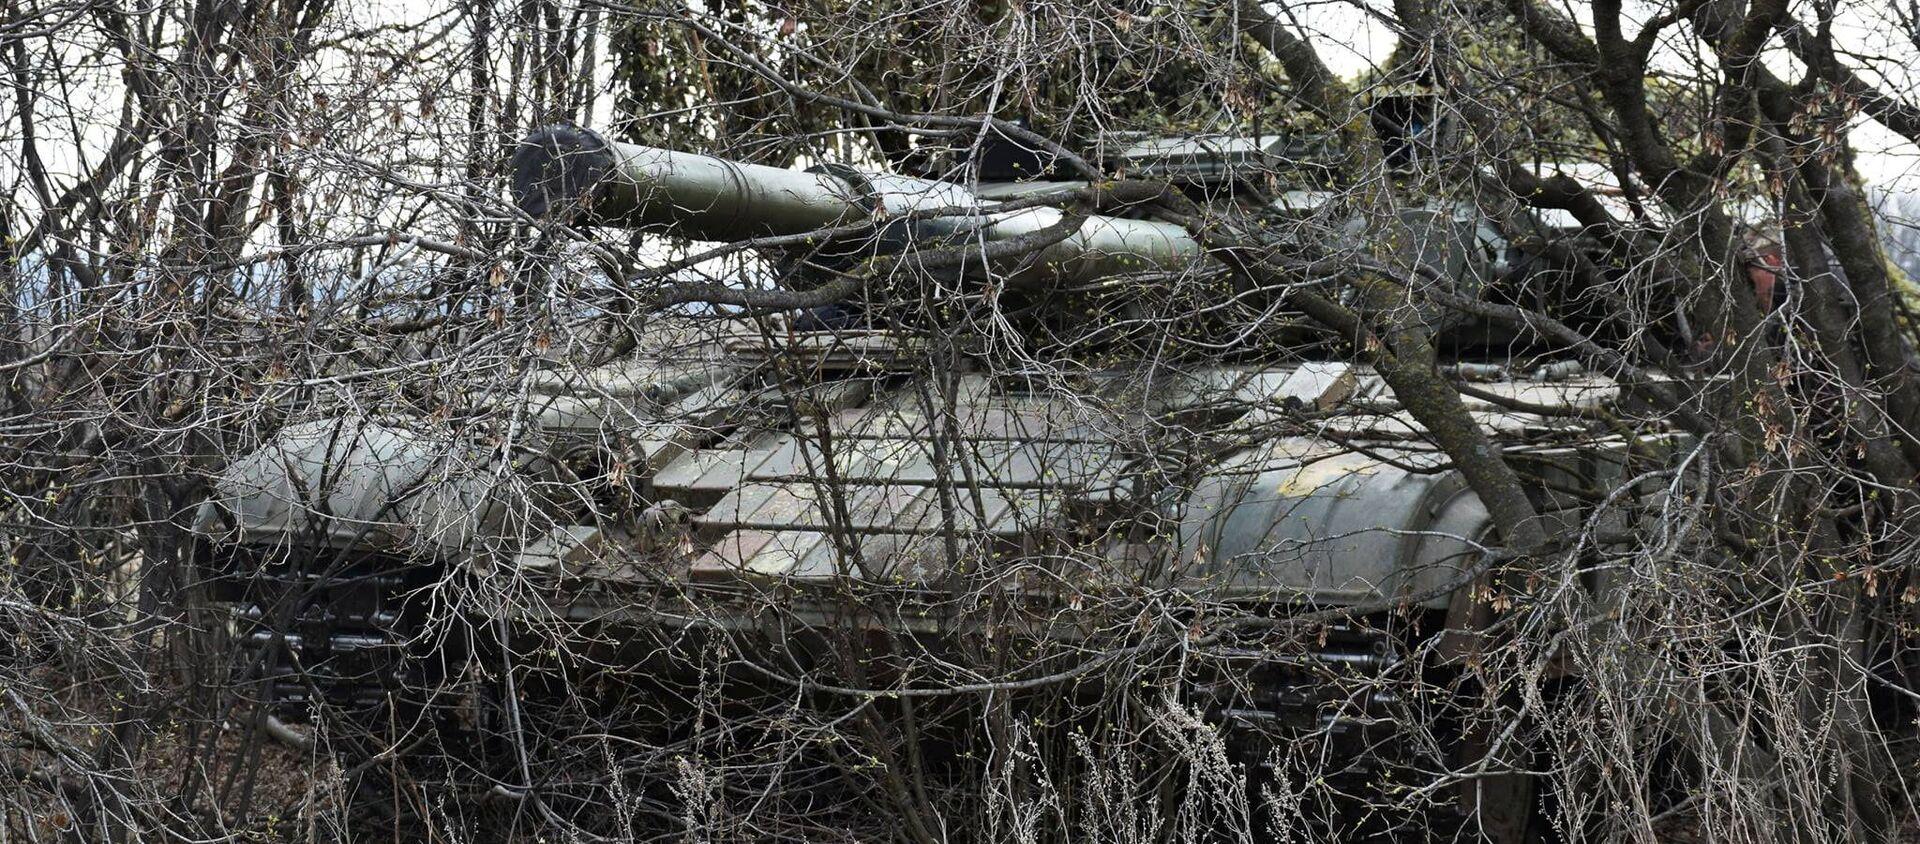 Konflikt zbrojny w Donbasie. - Sputnik Polska, 1920, 01.05.2021